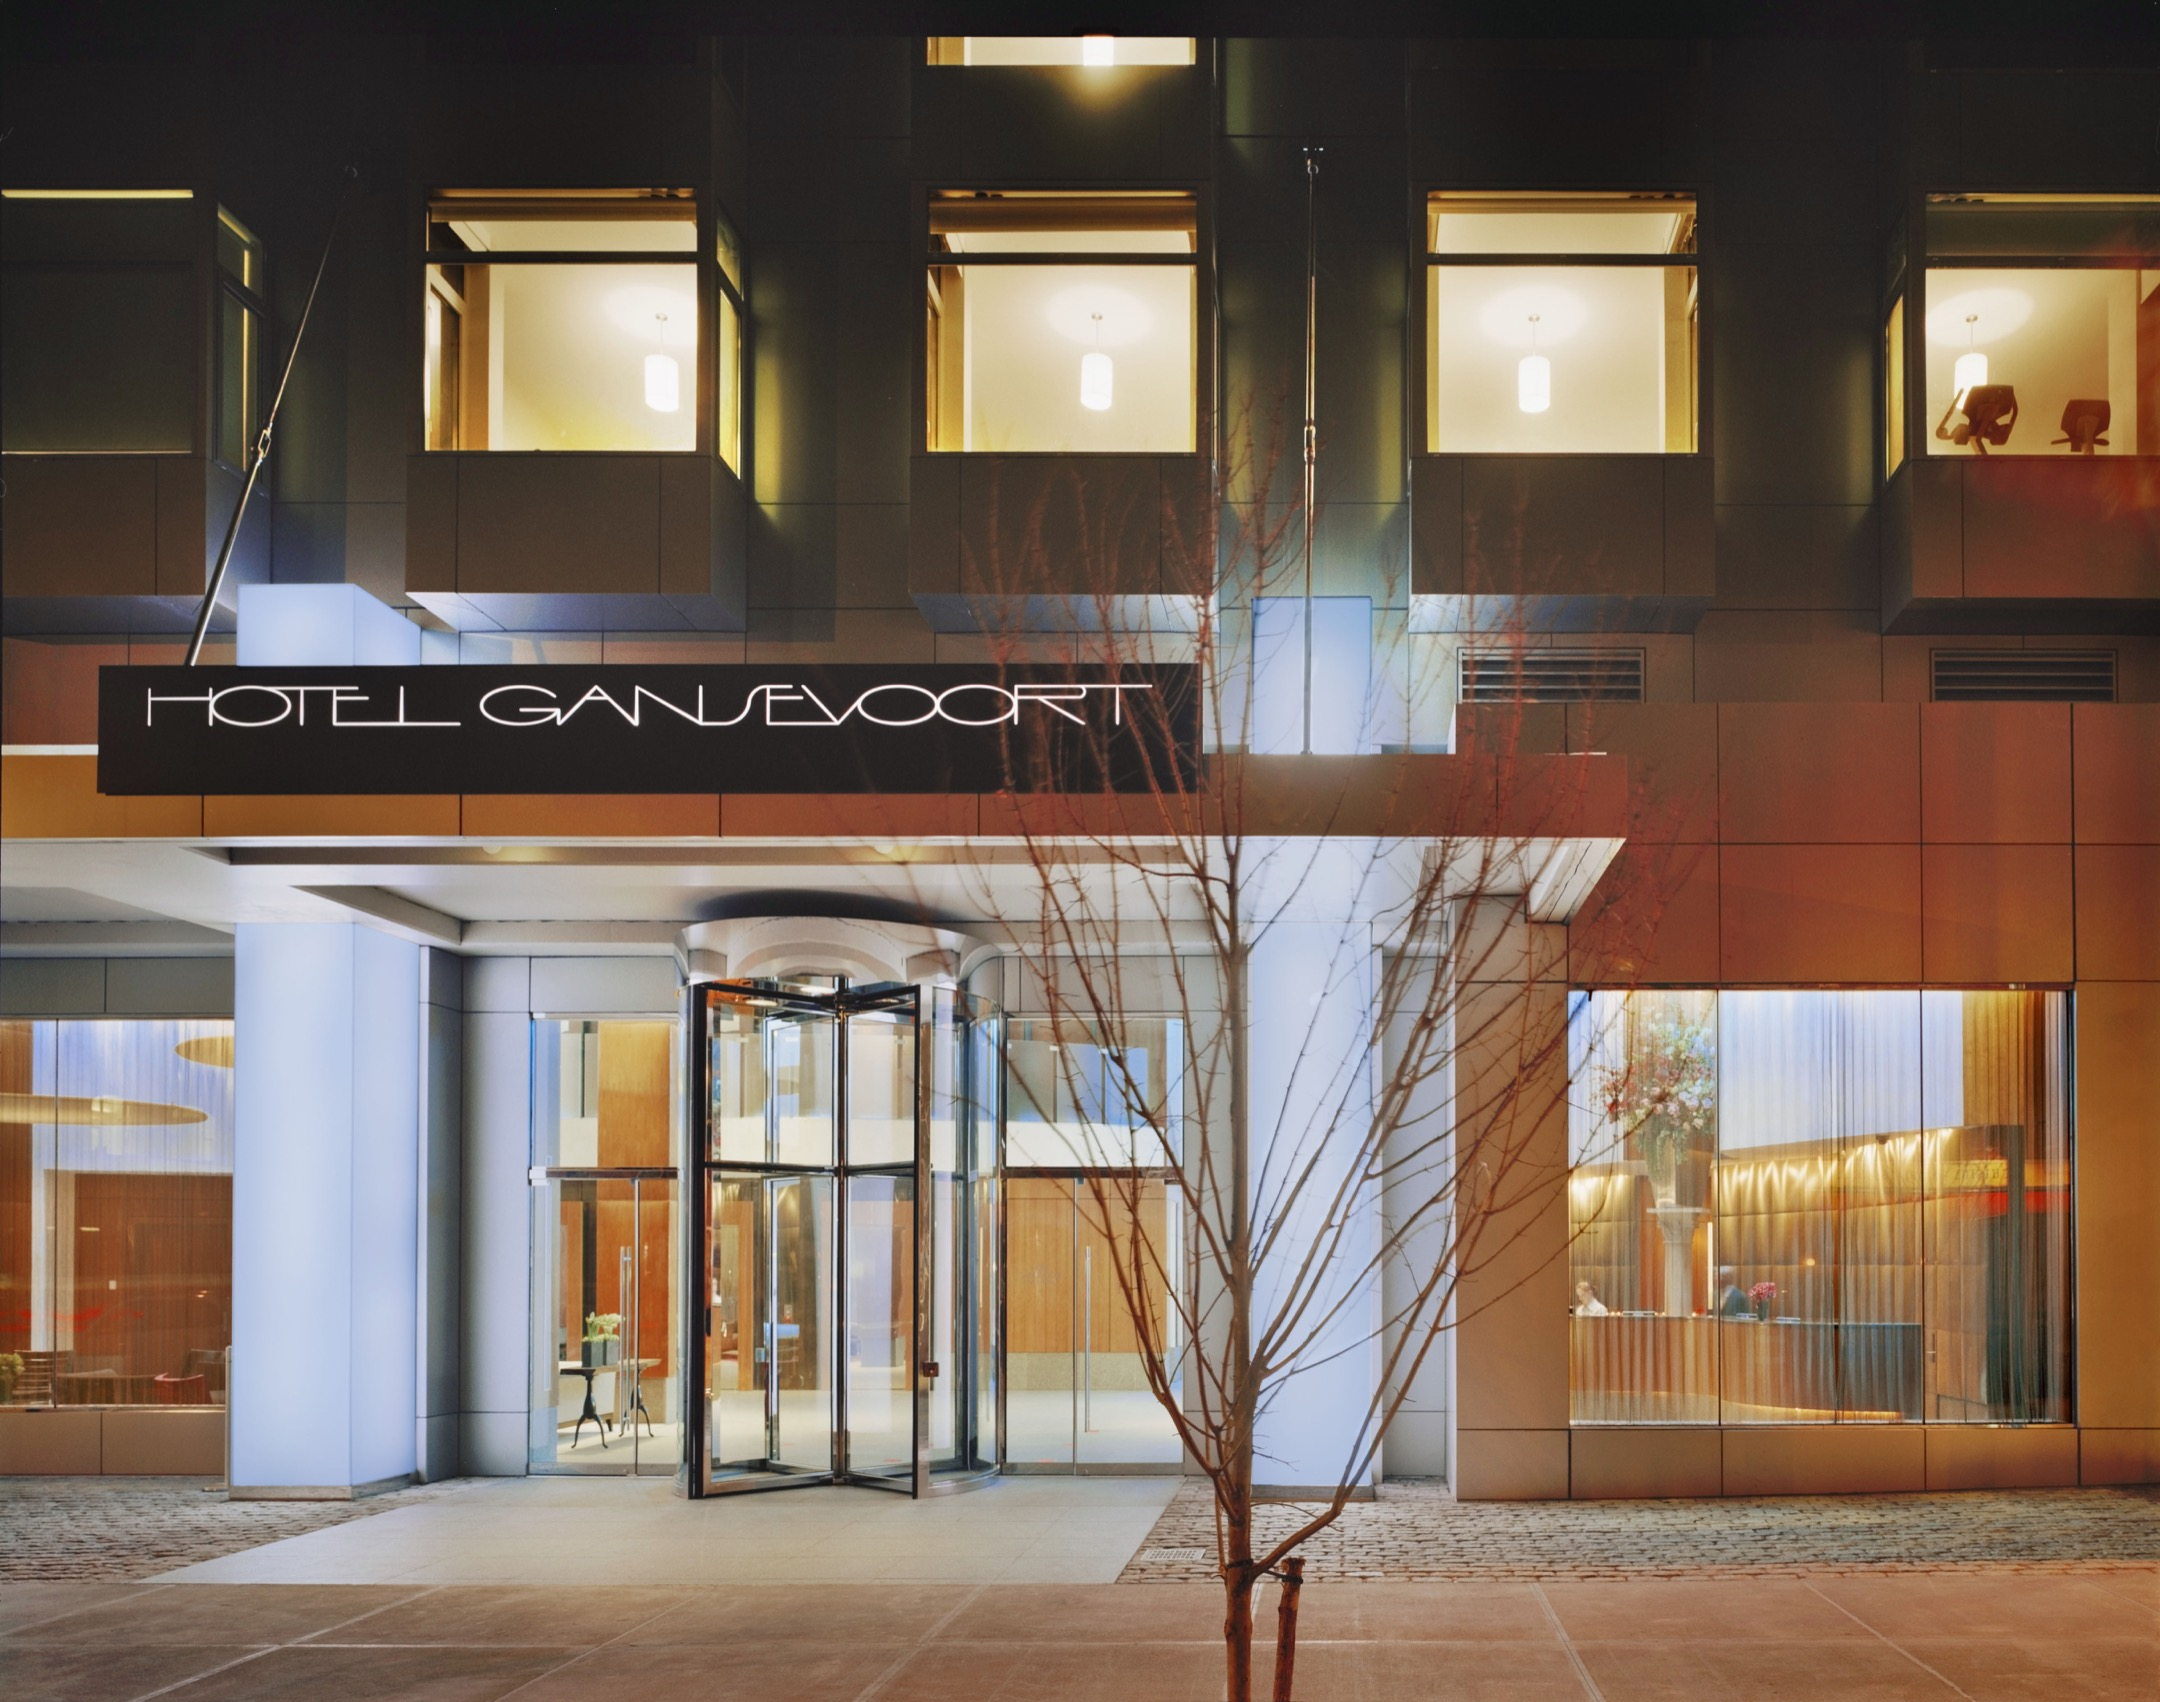 Gansevoort Hotel Nyc Vanceva